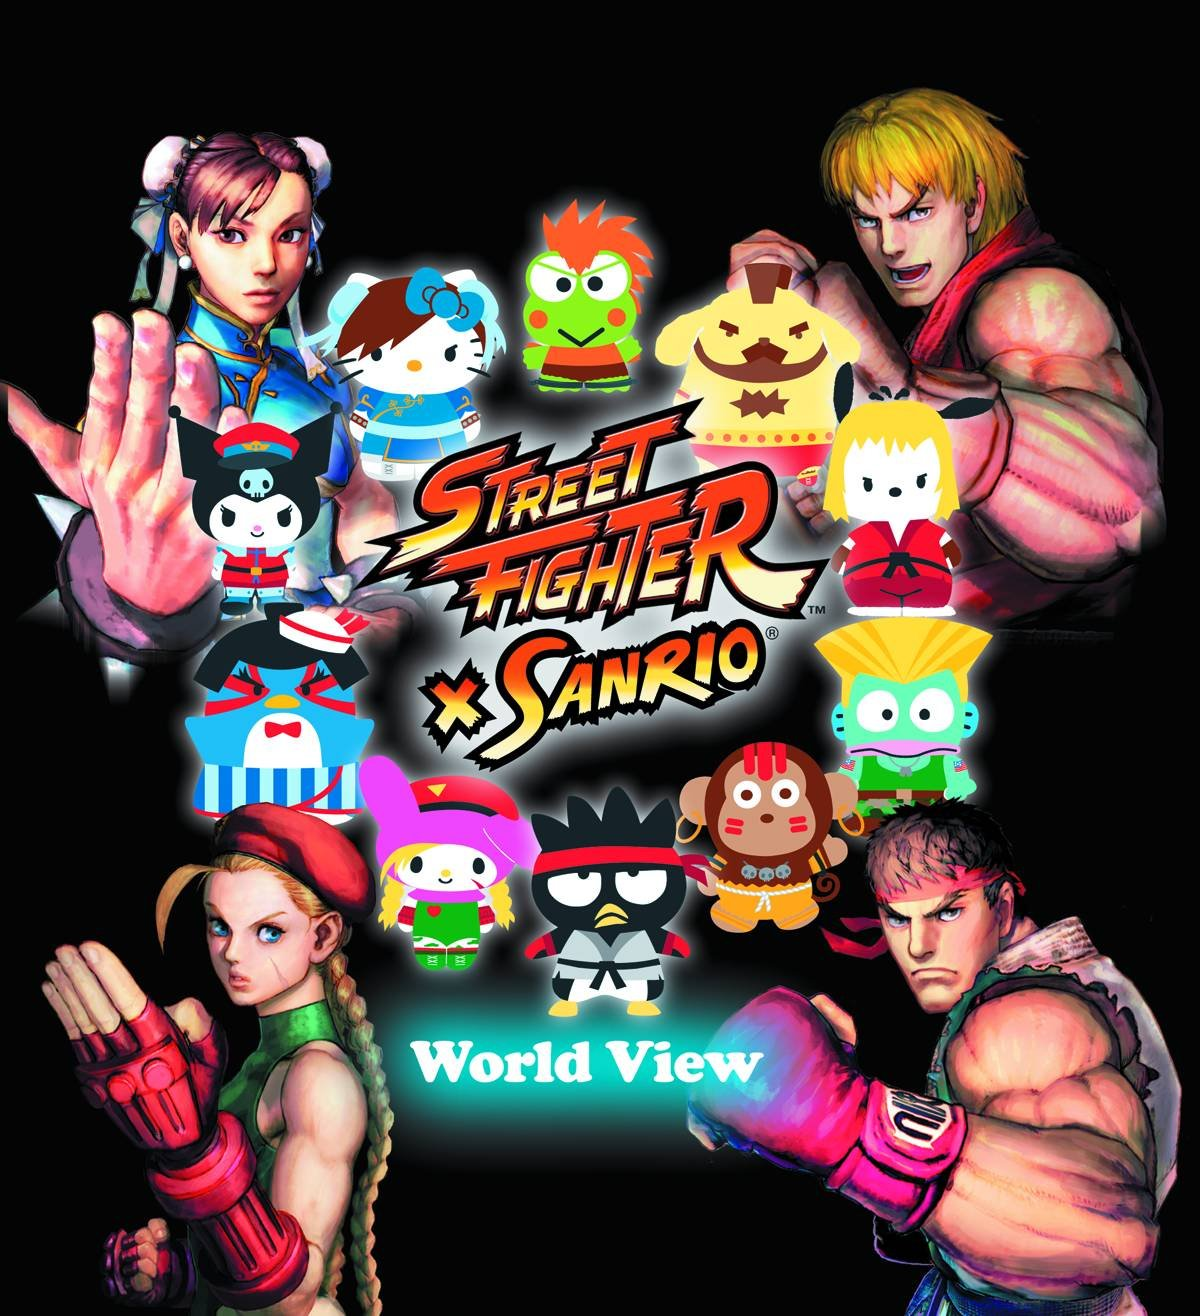 Street Fighter X Sanrio: World View PDF Text fb2 book